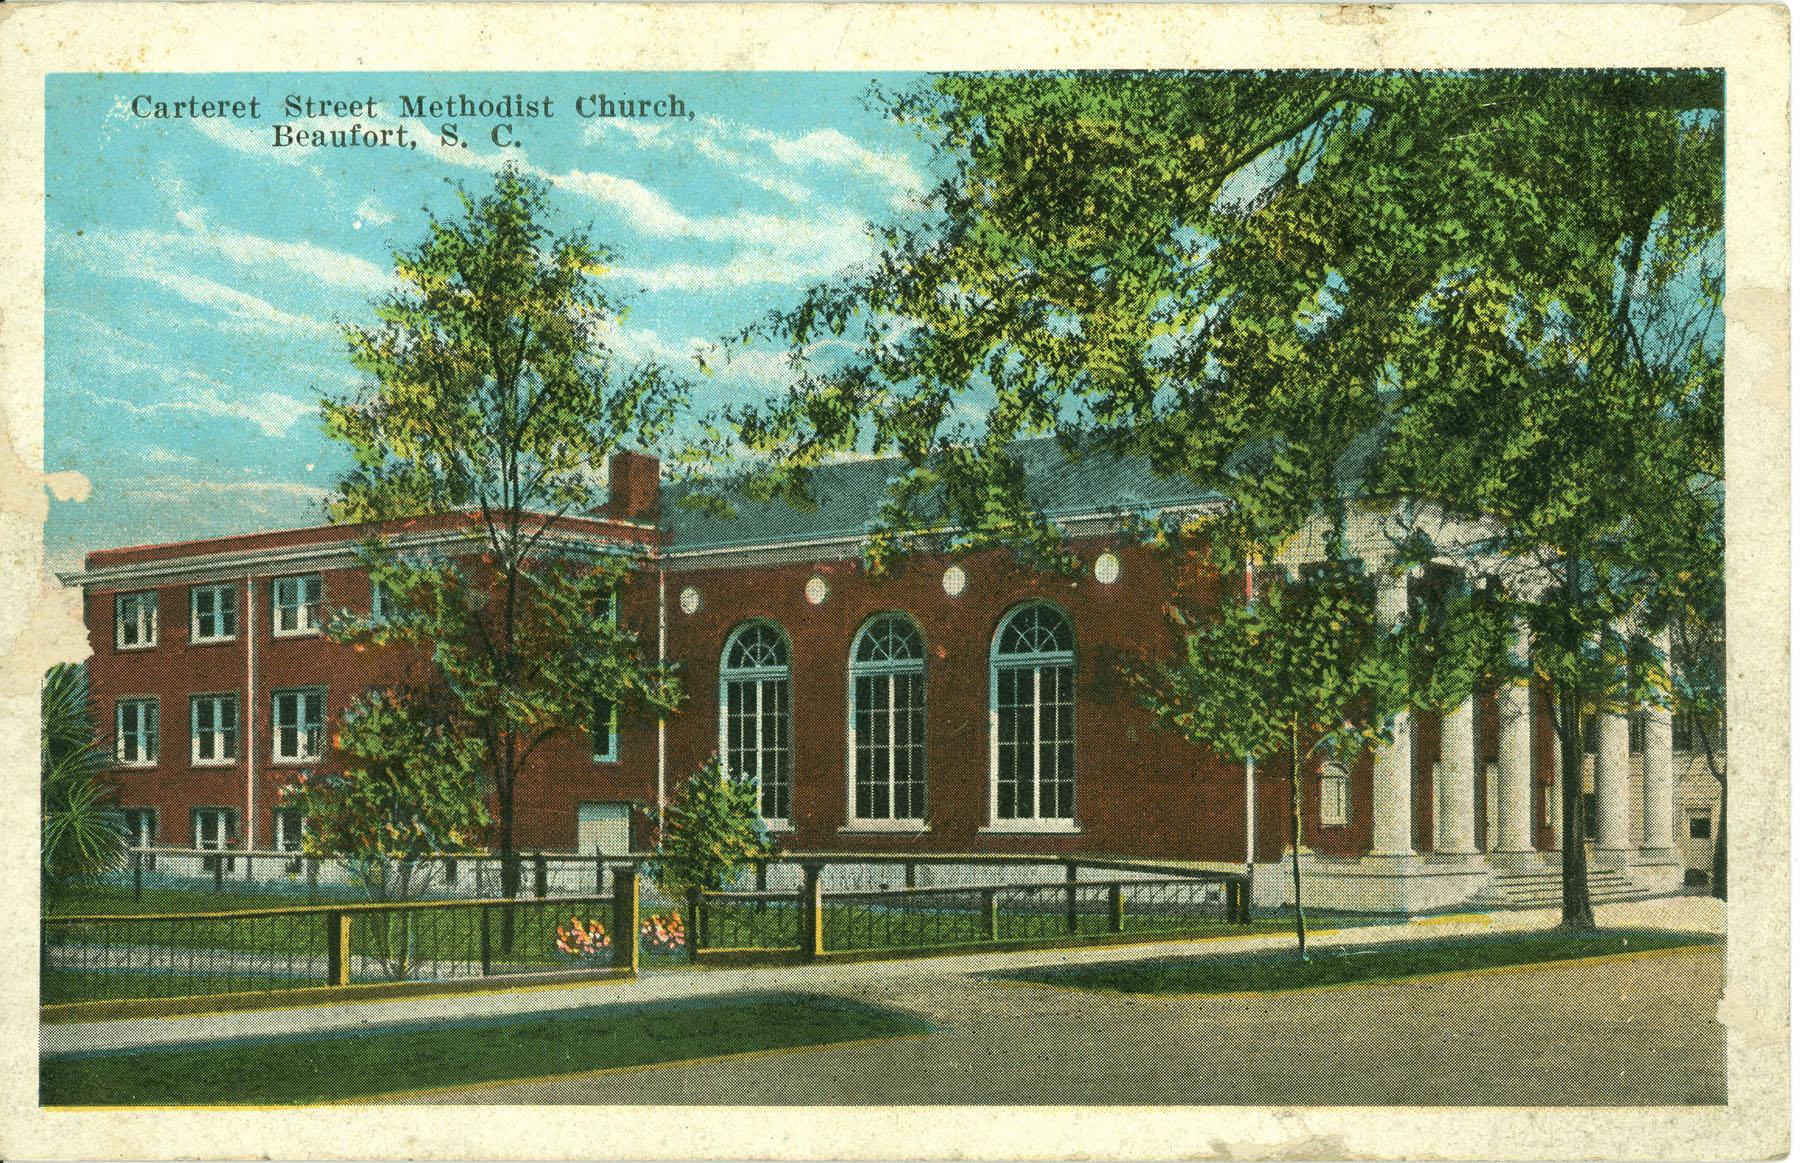 Carteret Street Methodist Church Beaufort, South Carolina